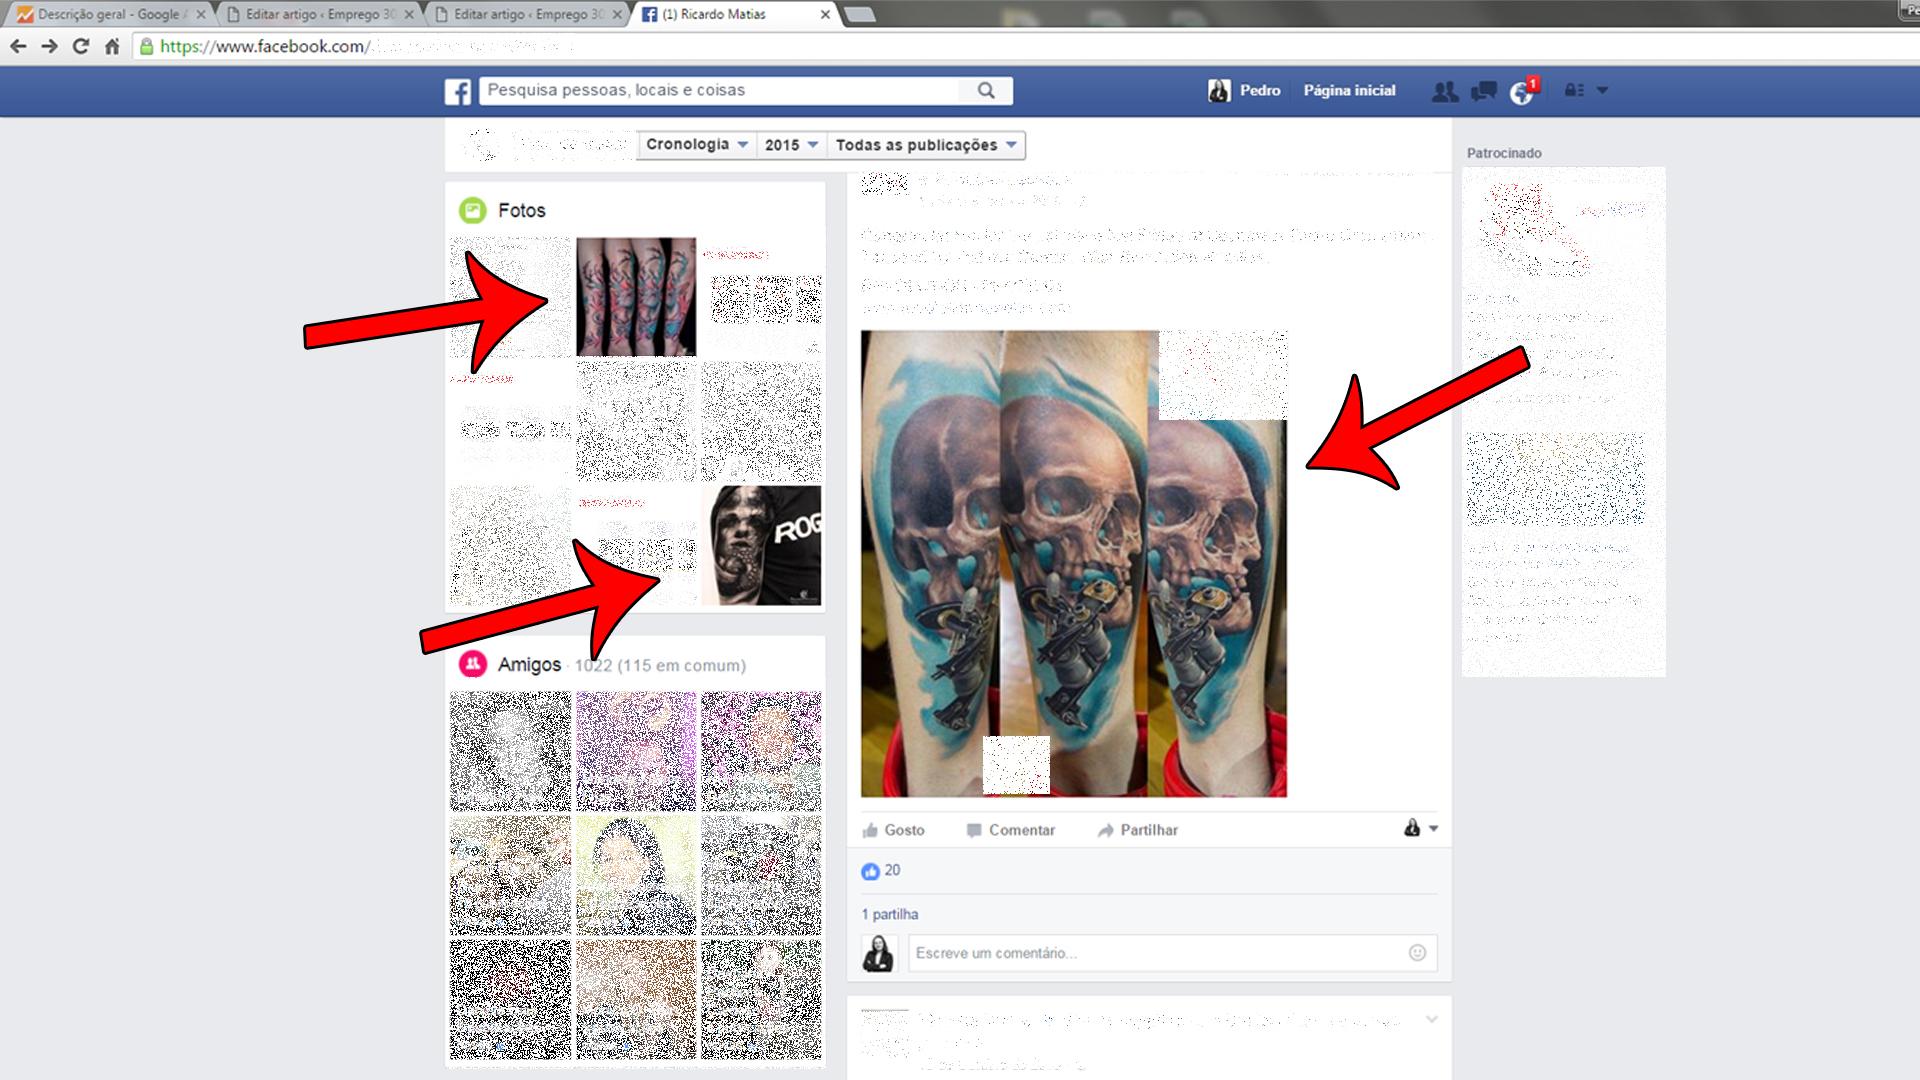 o seu perfil no Facebook